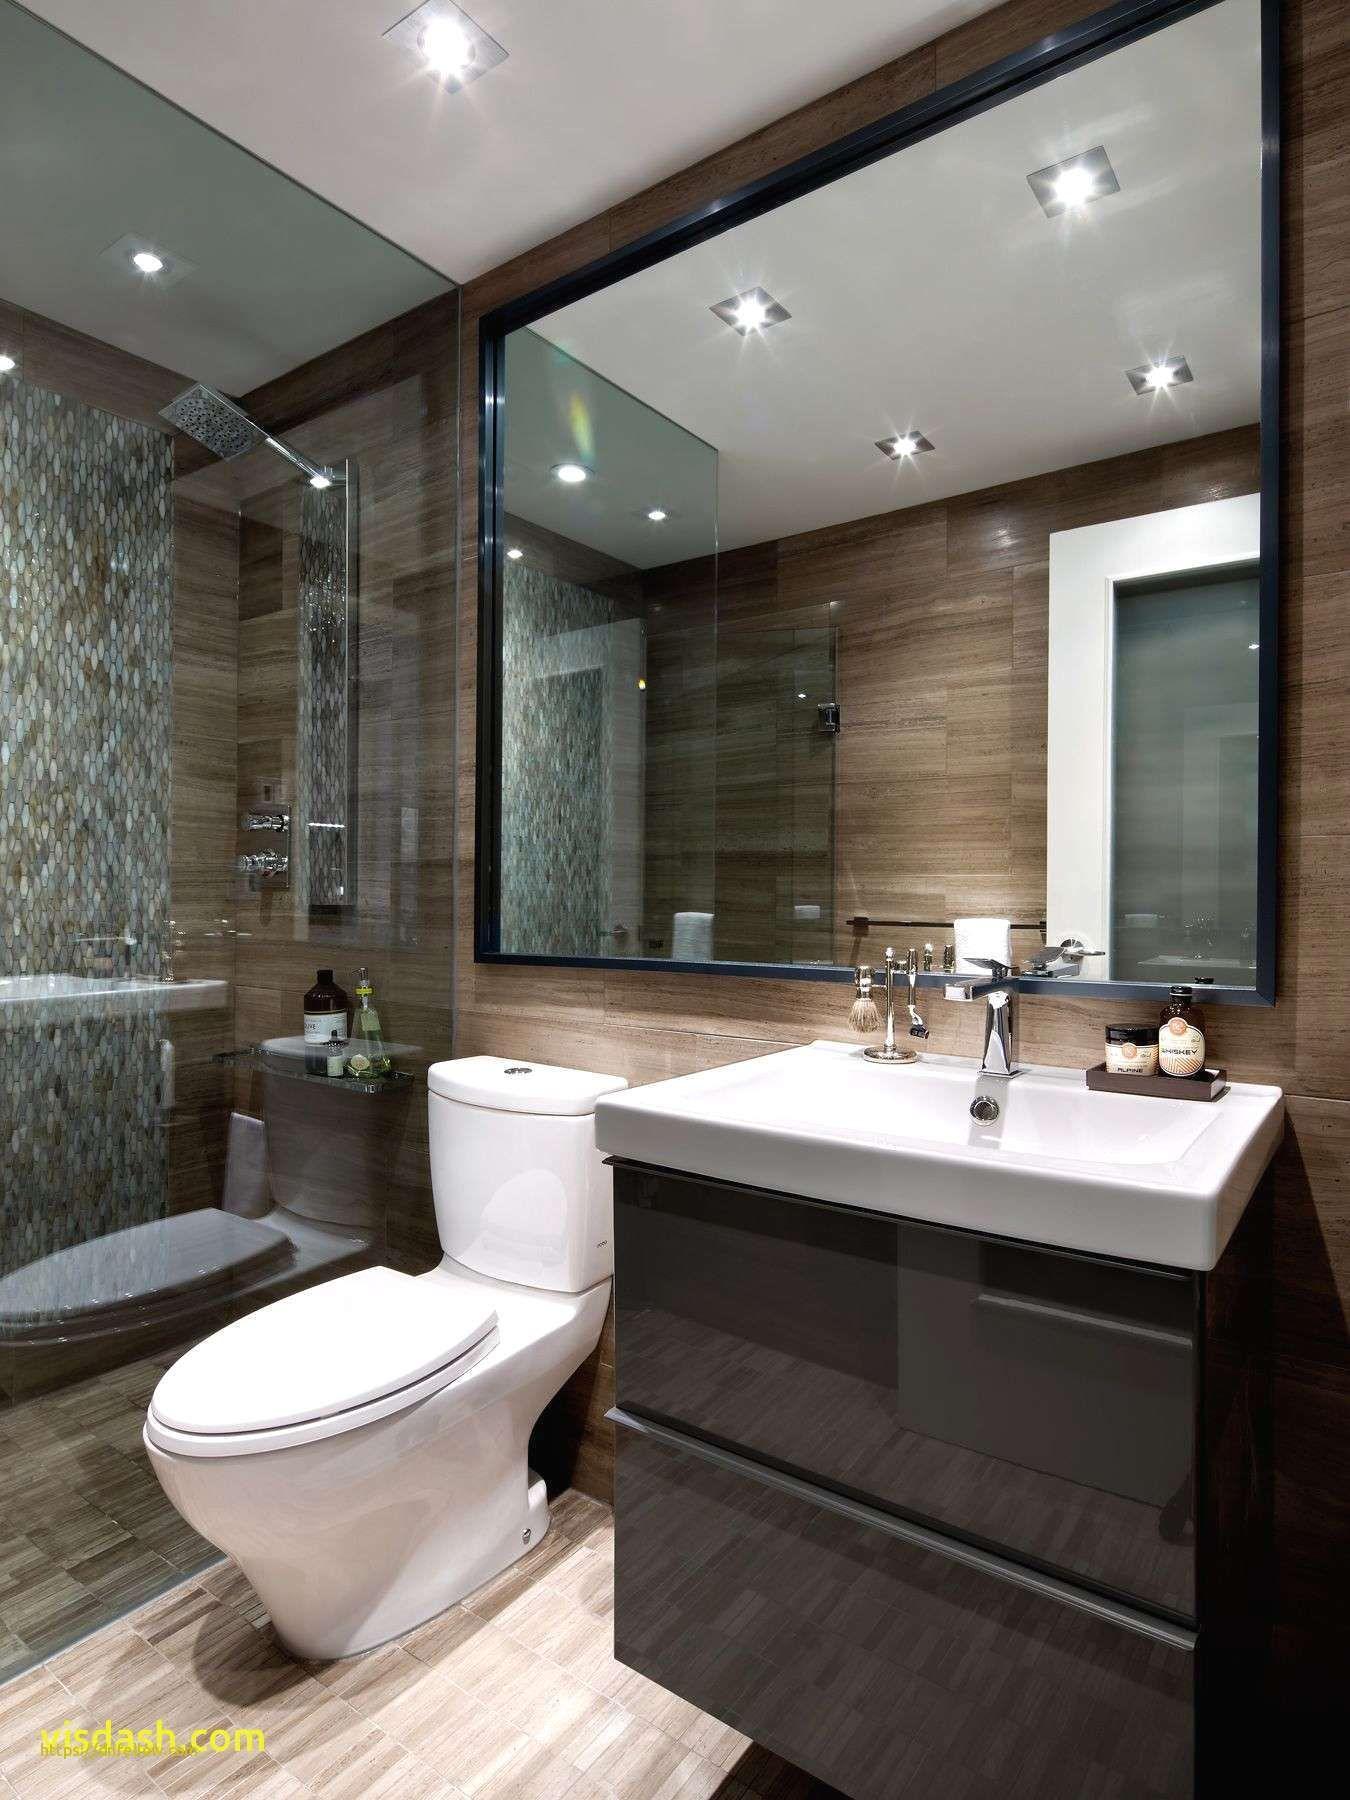 Lovely Bathroom Design 9x9 Lovely Bathroom Design 9x9 Delightful To My Personal Blog Site Within This Moment H Ide Kamar Mandi Kamar Mandi Kecil Rumah